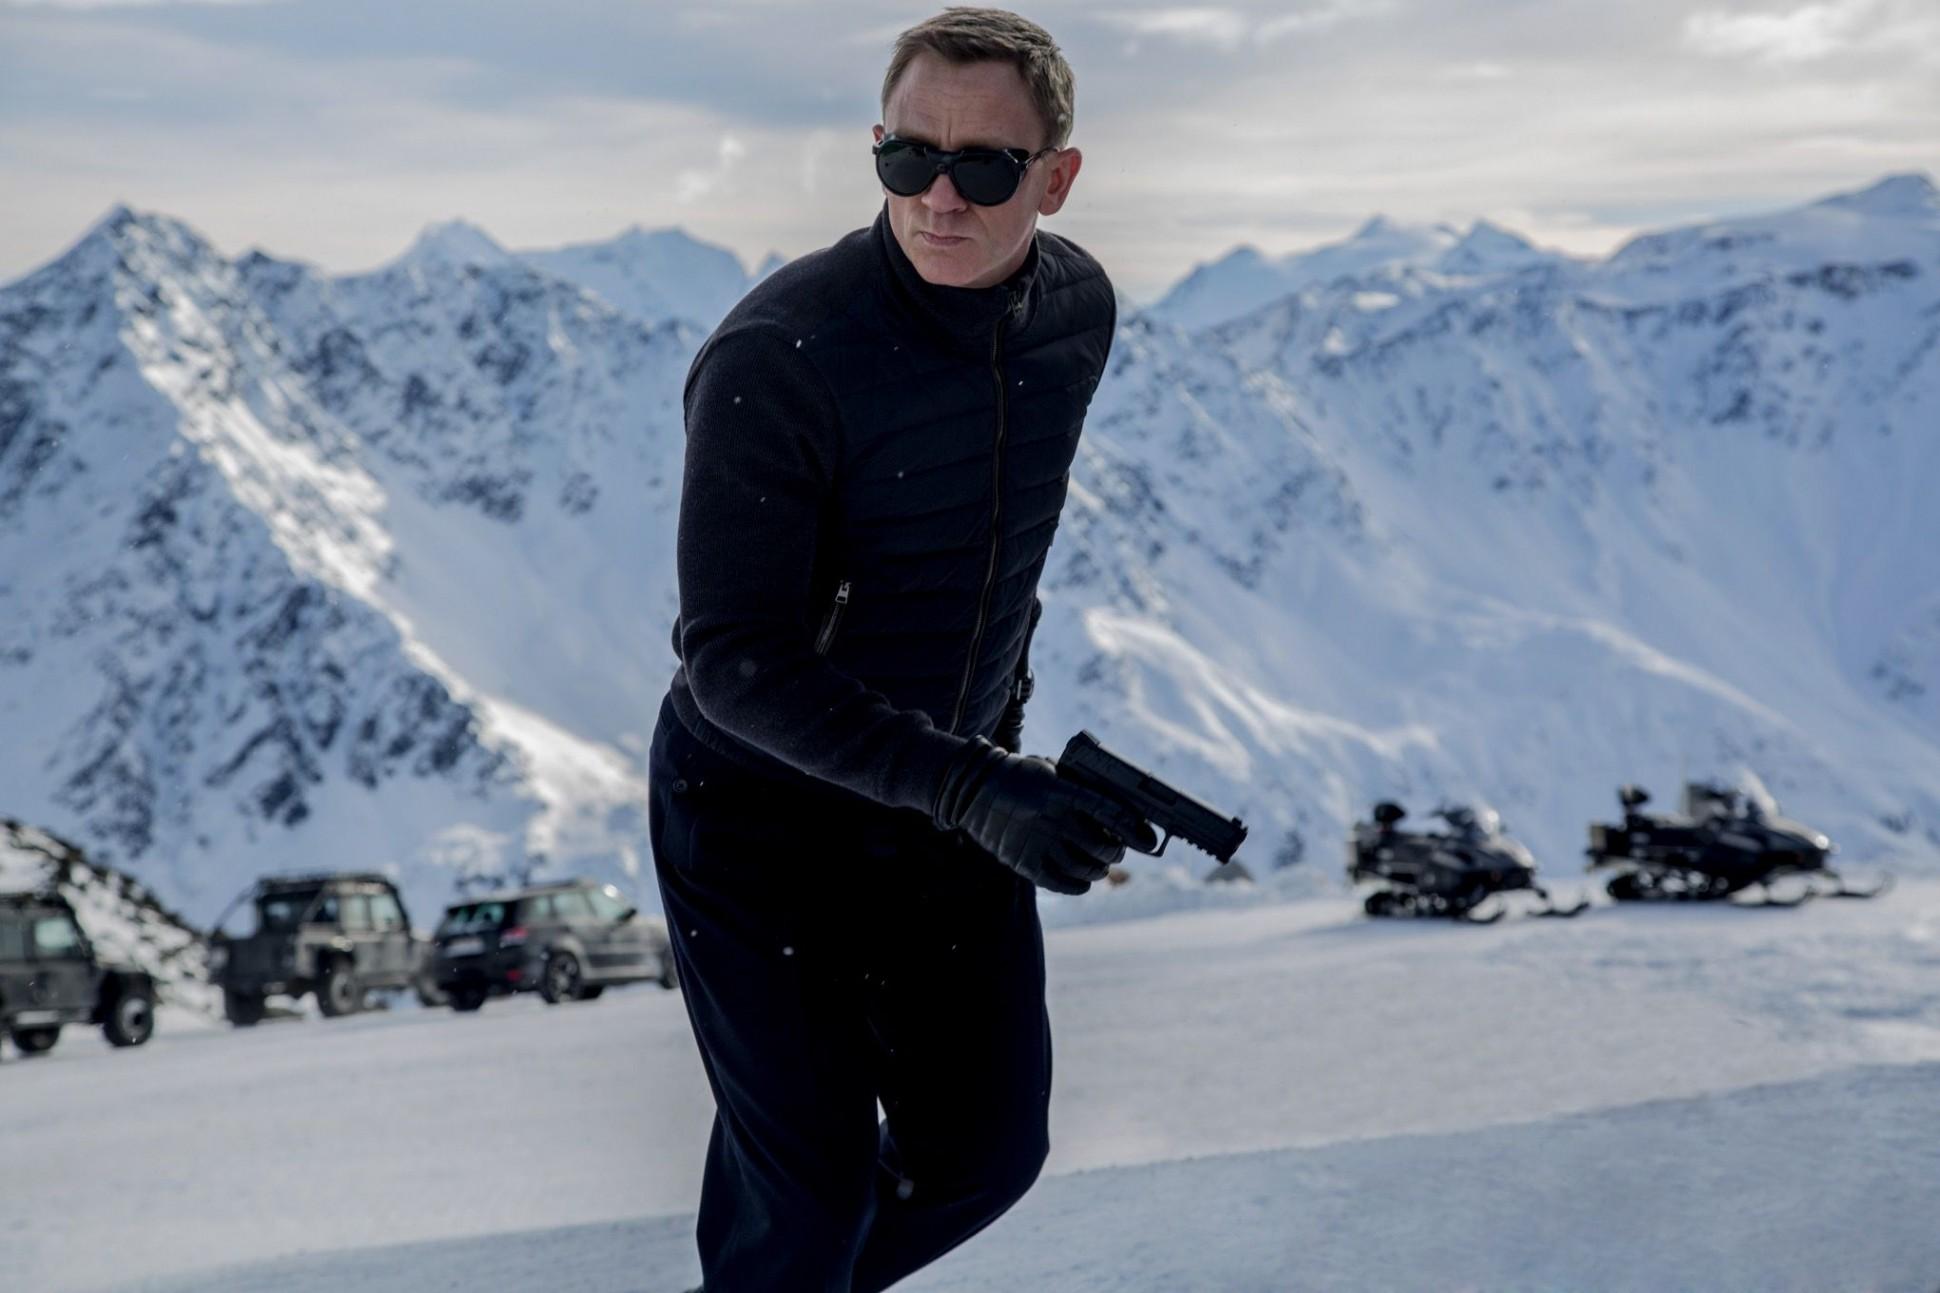 The name's Bond. James Bond.